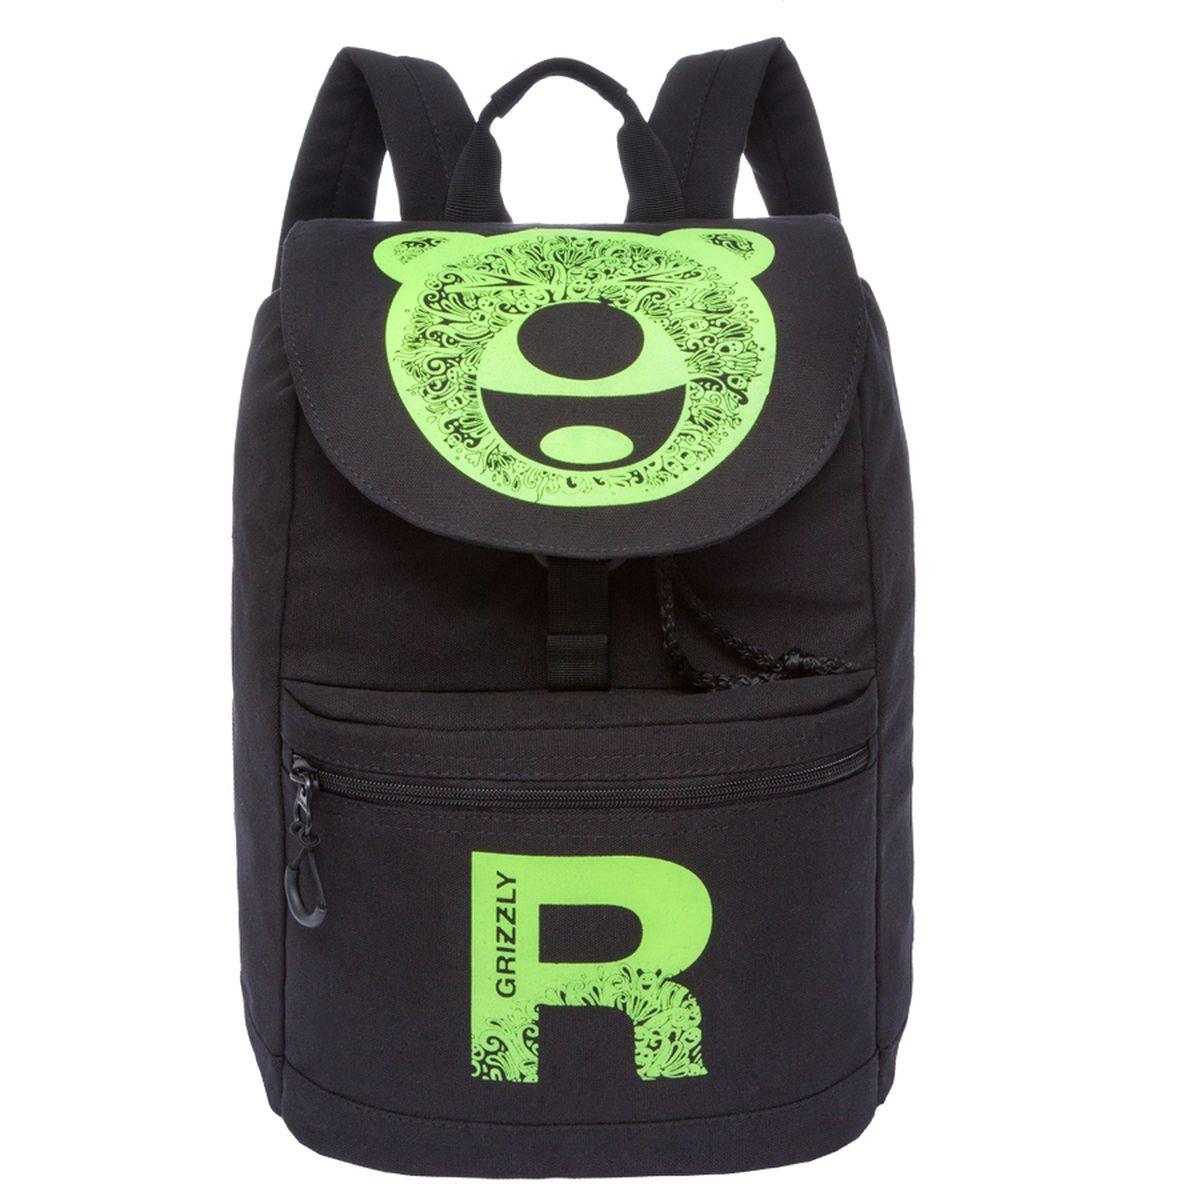 Рюкзак молодежный Grizzly, цвет: черный-желтый. 18 л. RD-744-1/2 рюкзаки grizzly рюкзак